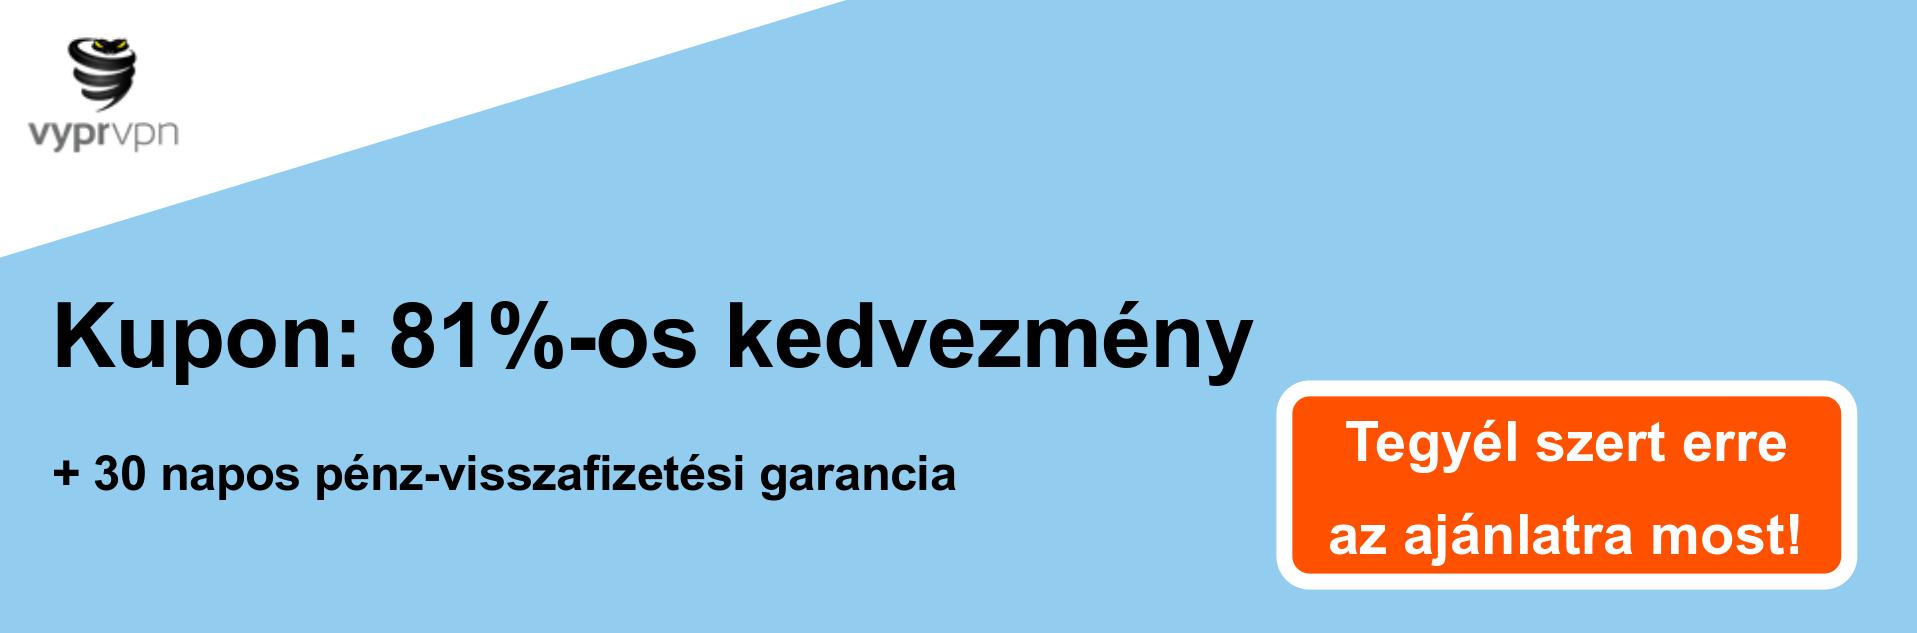 Vypr VPN szelvény banner - 81% kedvezmény